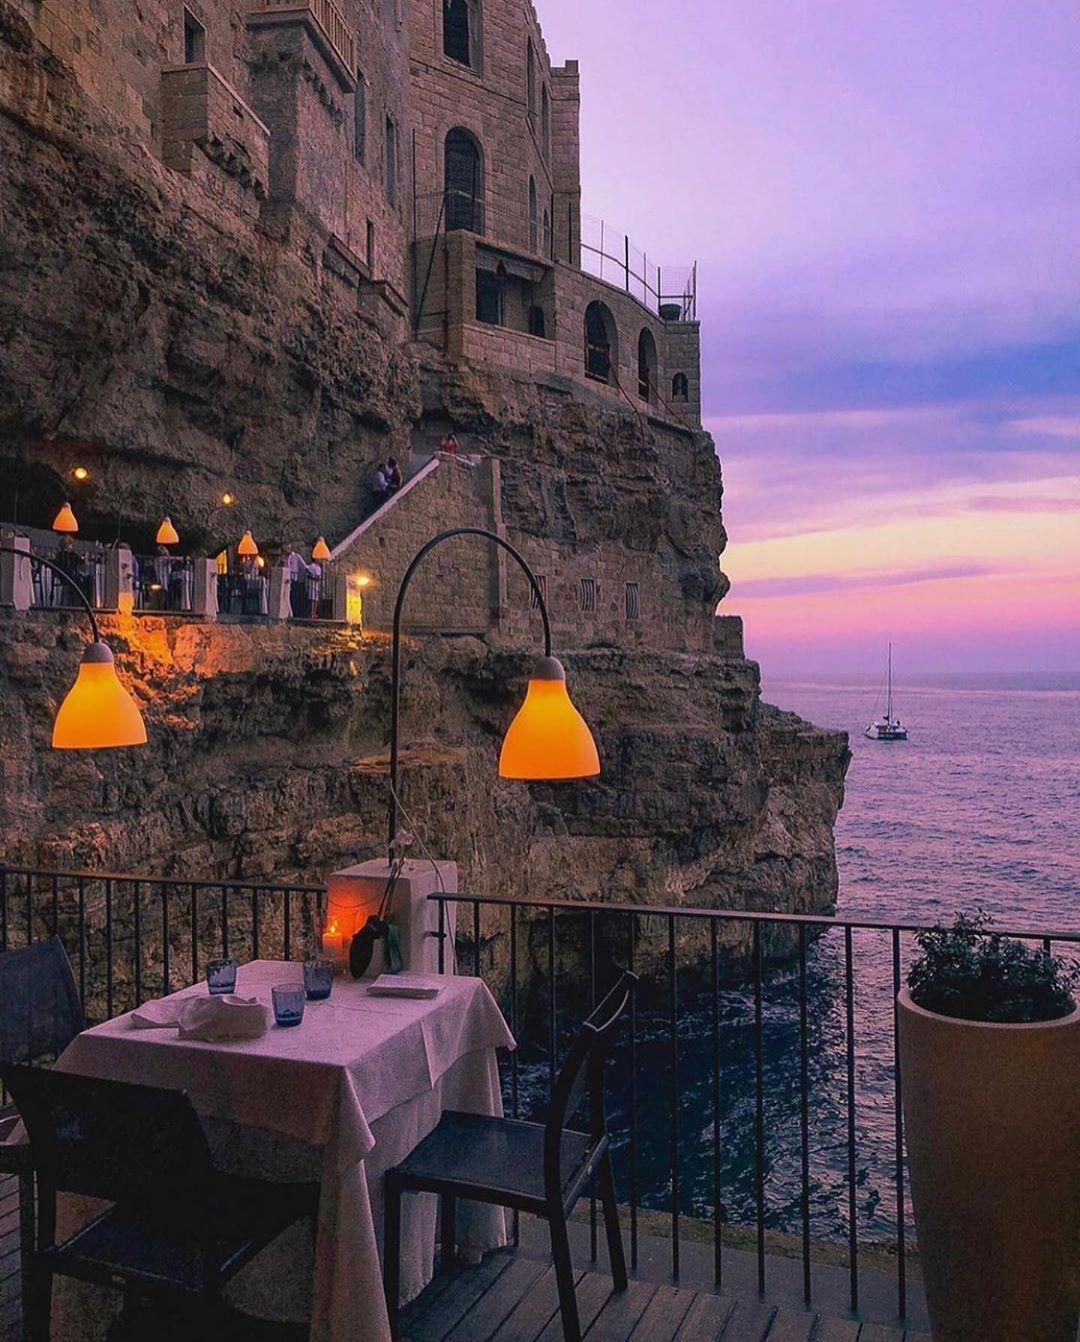 "Italia ✦ SUPER ITALY ✦  🇮🇹 on Instagram: ""Photo: @pinkines  #super_italy 🇮🇹 #PolignanoAMare  @SuperHubs Team  #italia #italy #europe #super_europe #living_europe…"""